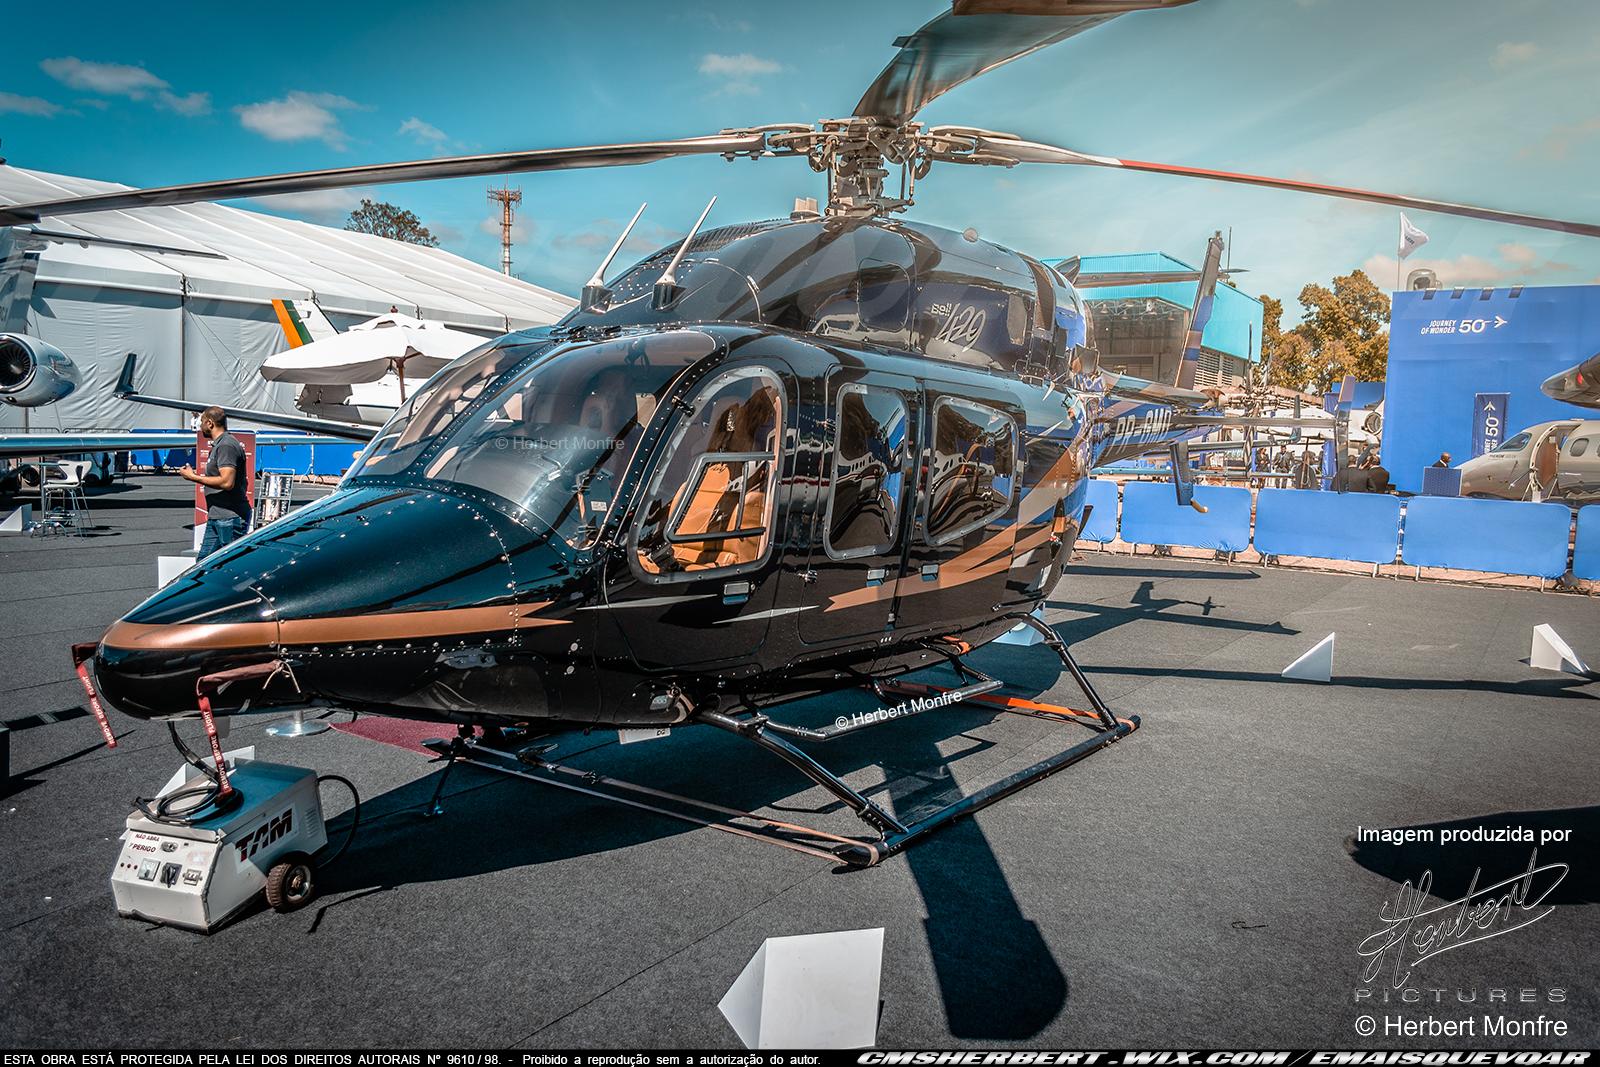 Bell 429 | PR-GMD | Foto © Herbert Monfre - Contrate o fotógrafo em cmsherbert@hotmail.com | by É MAIS QUE VOAR | LABACE 2019